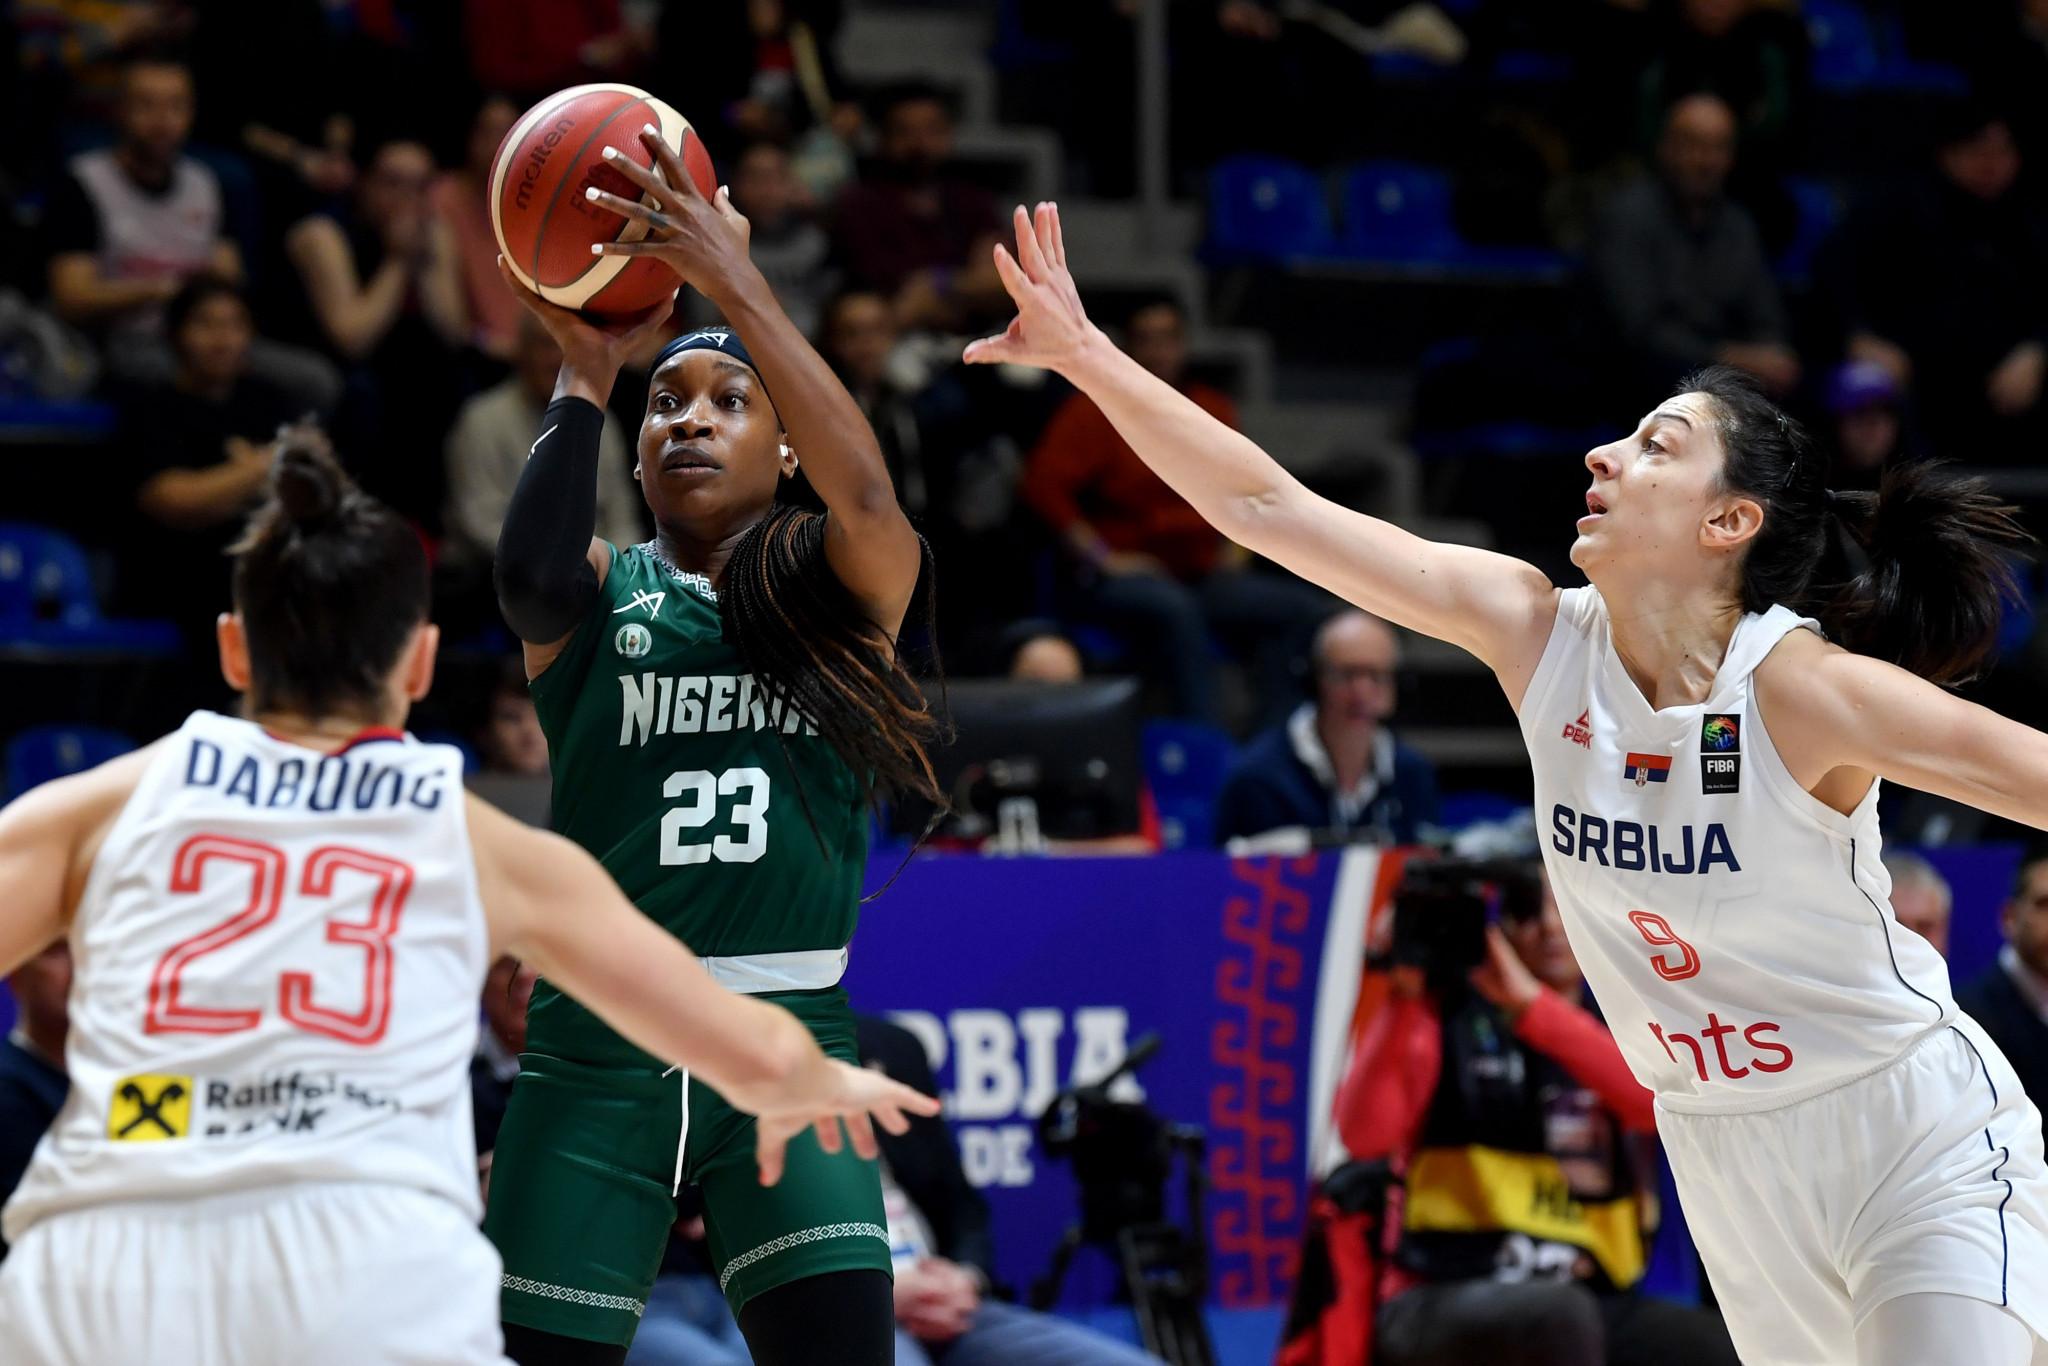 Nigerian basketball star Ezinne Kalu also runs a cosmetics business © Getty Images